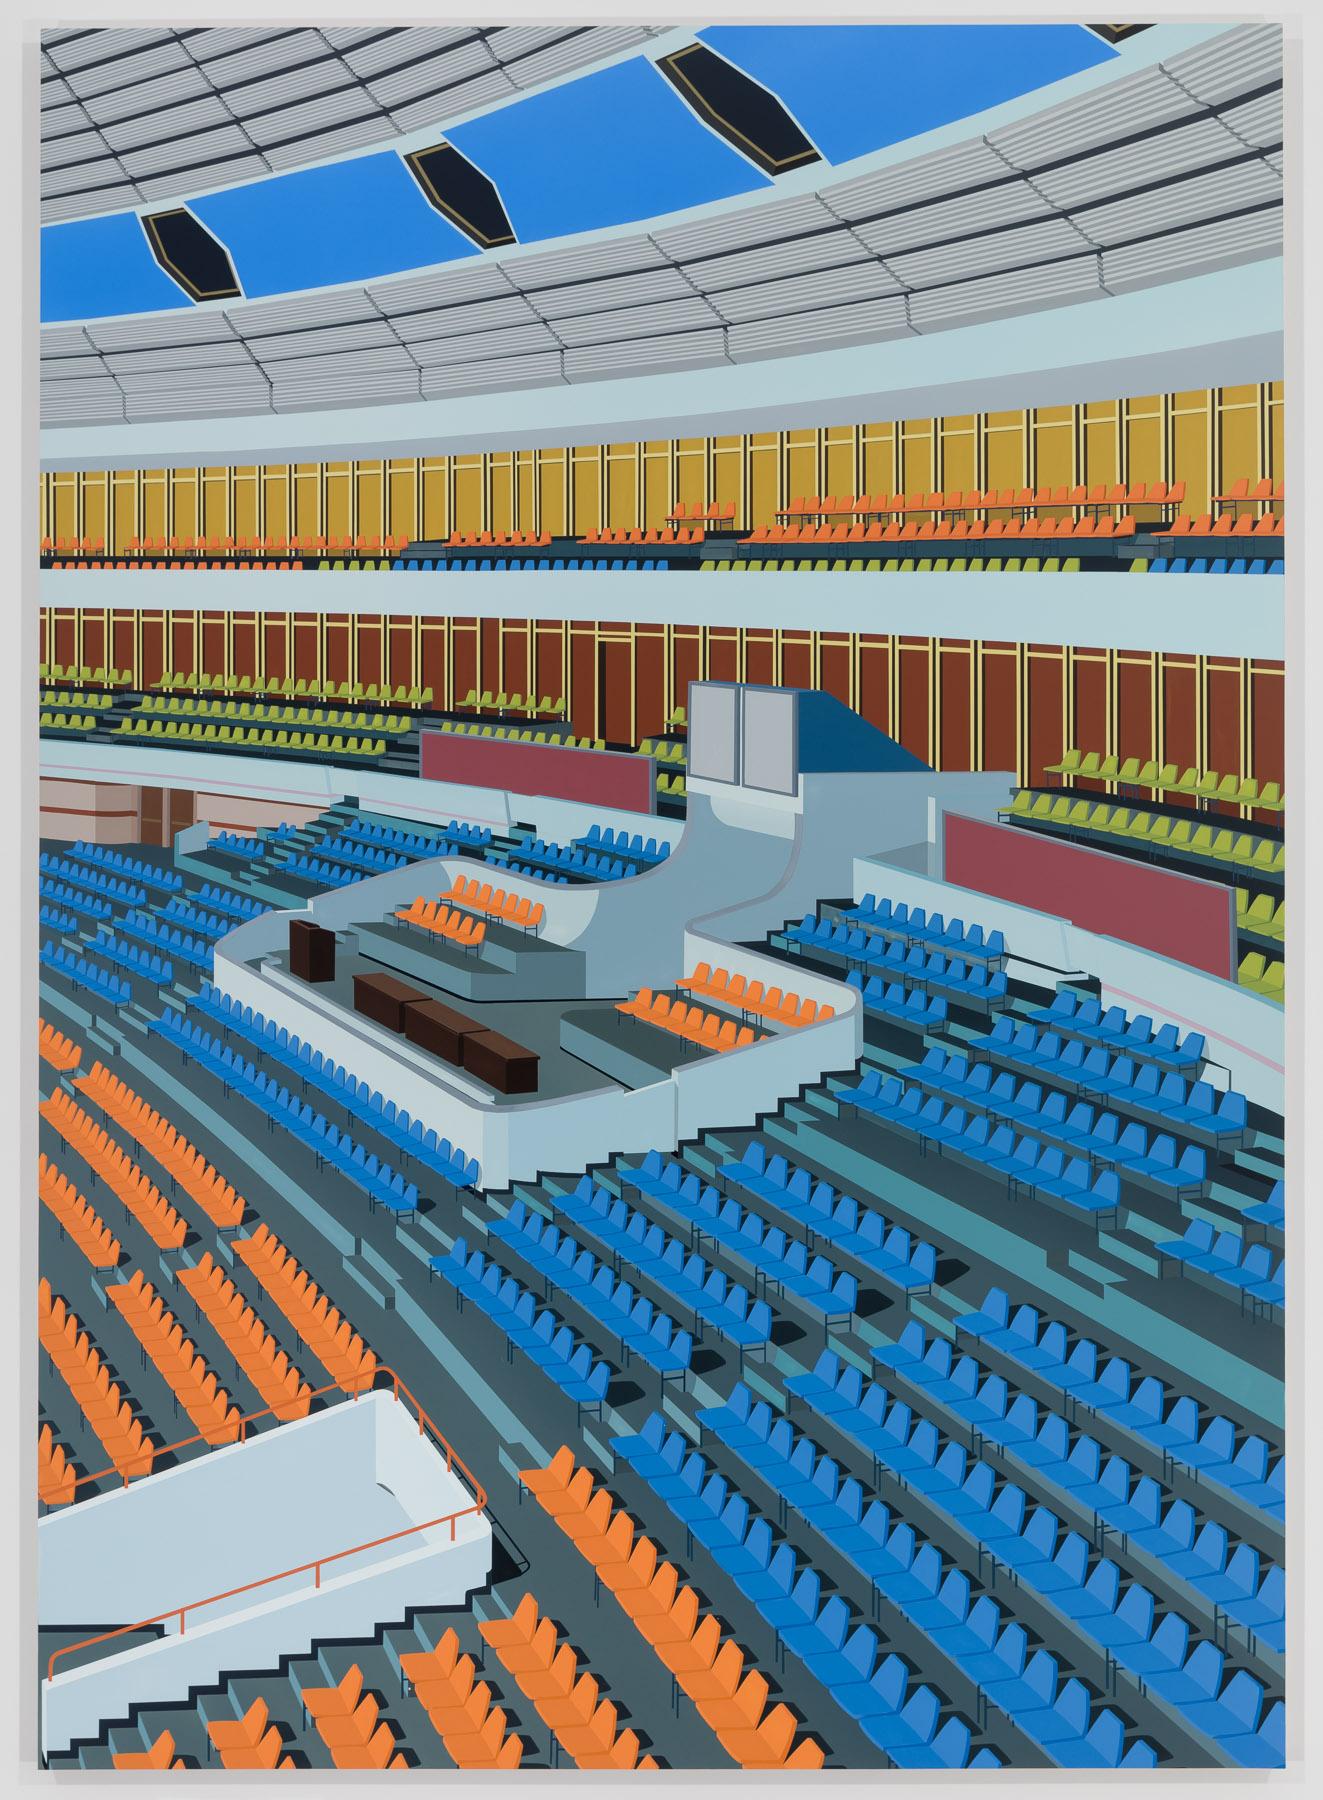 Stadium, Pyongyang, 2018. Acrylic on Dibond, 84 x 60 inches (213.4 x 152.4 cm)